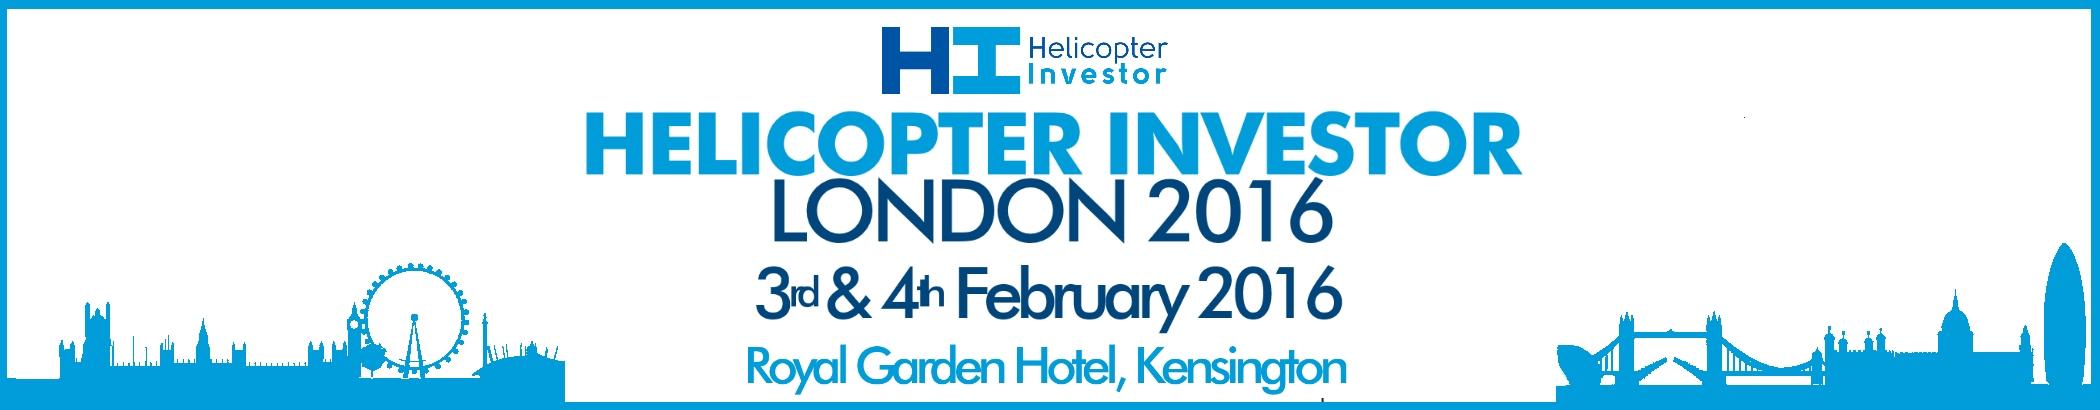 London Heli banner 16